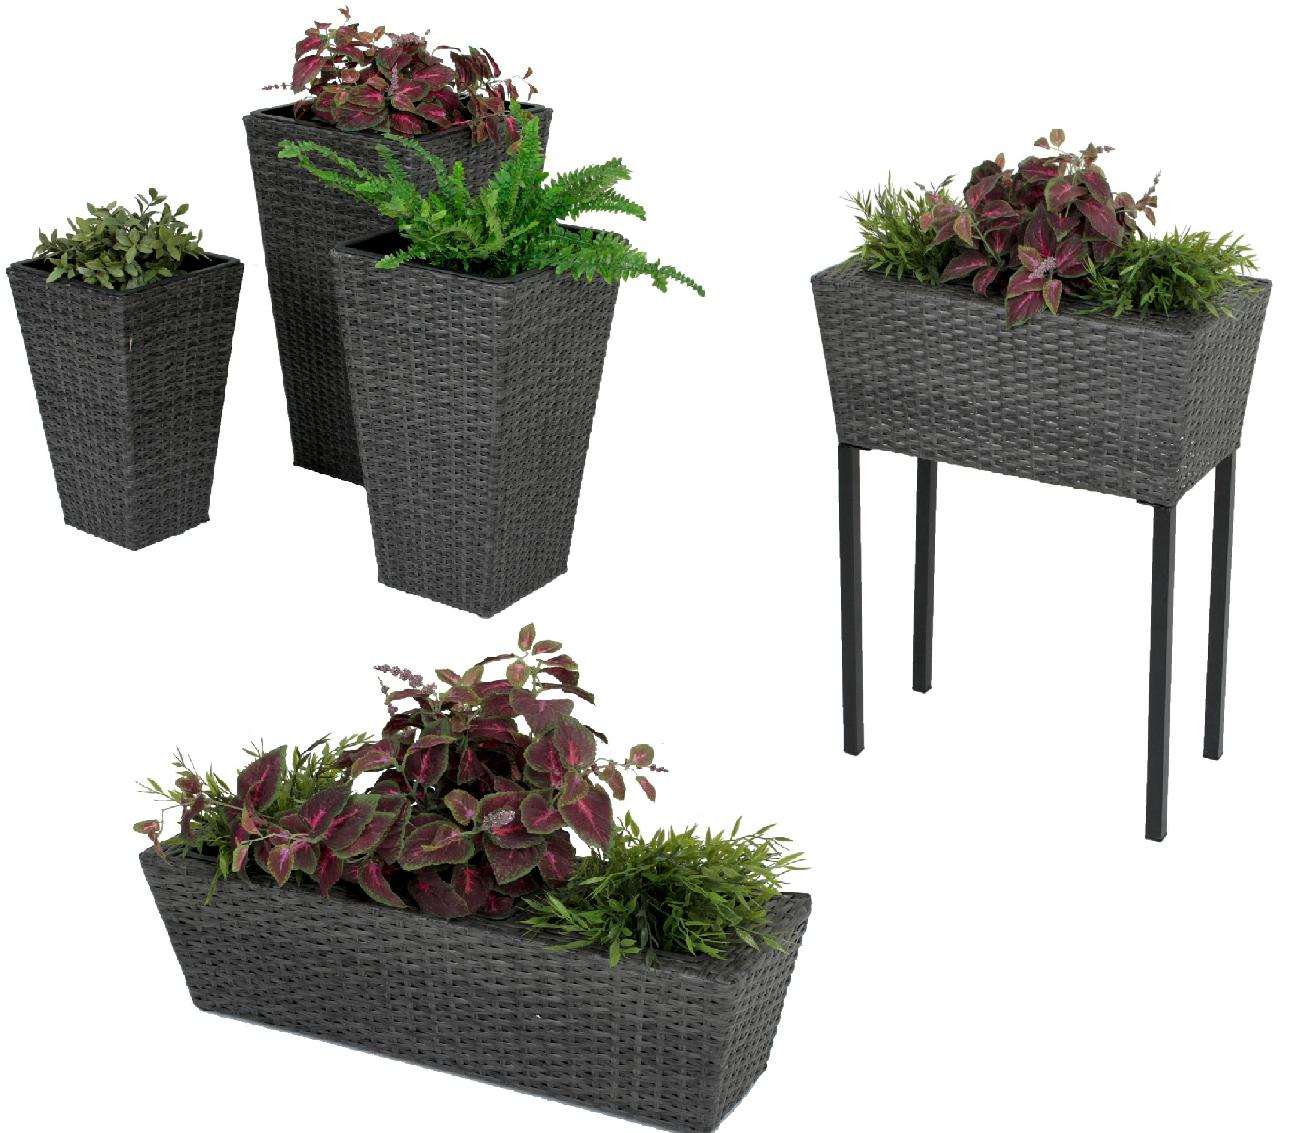 hochbeet pflanztopf balkonk sten rattan blumentopf bertopf pflanzk bel topf ebay. Black Bedroom Furniture Sets. Home Design Ideas